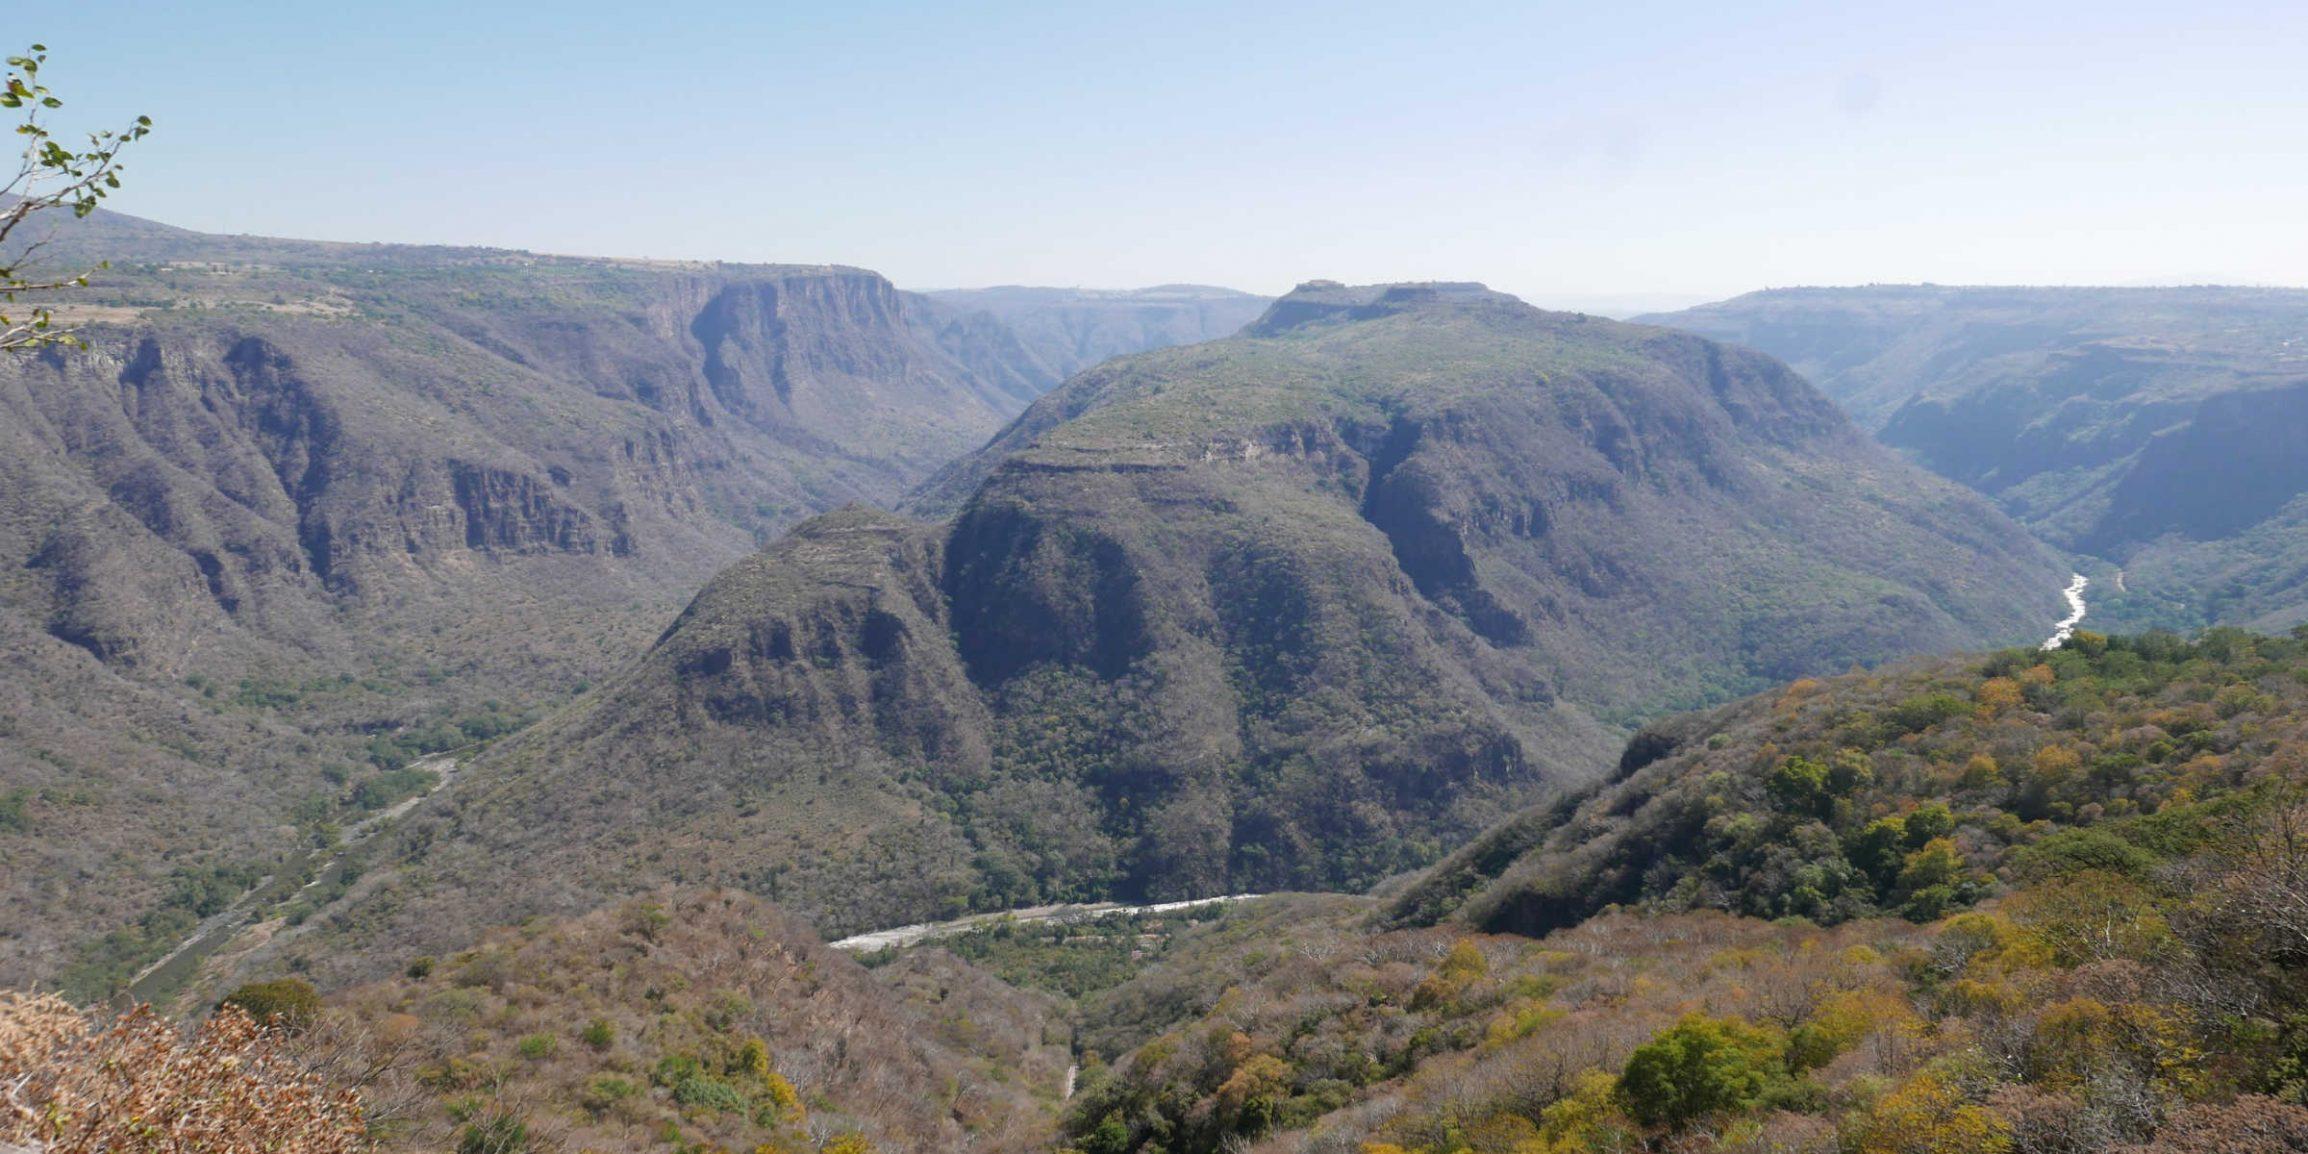 Barranca de Huentitan canyon in Guadalajara